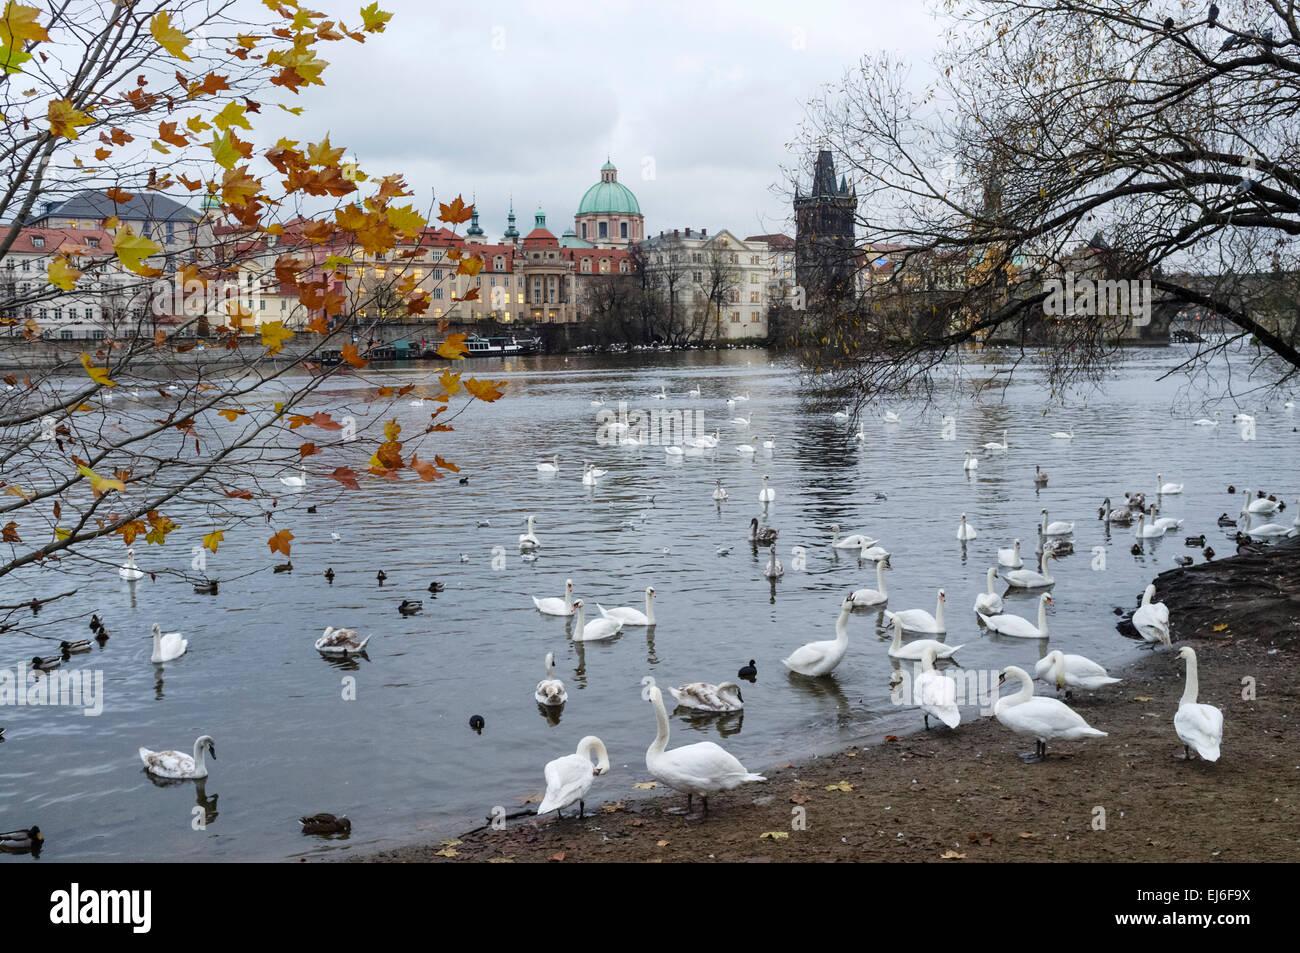 Swans at the Vltava river. Prague, Czech Republic - Stock Image